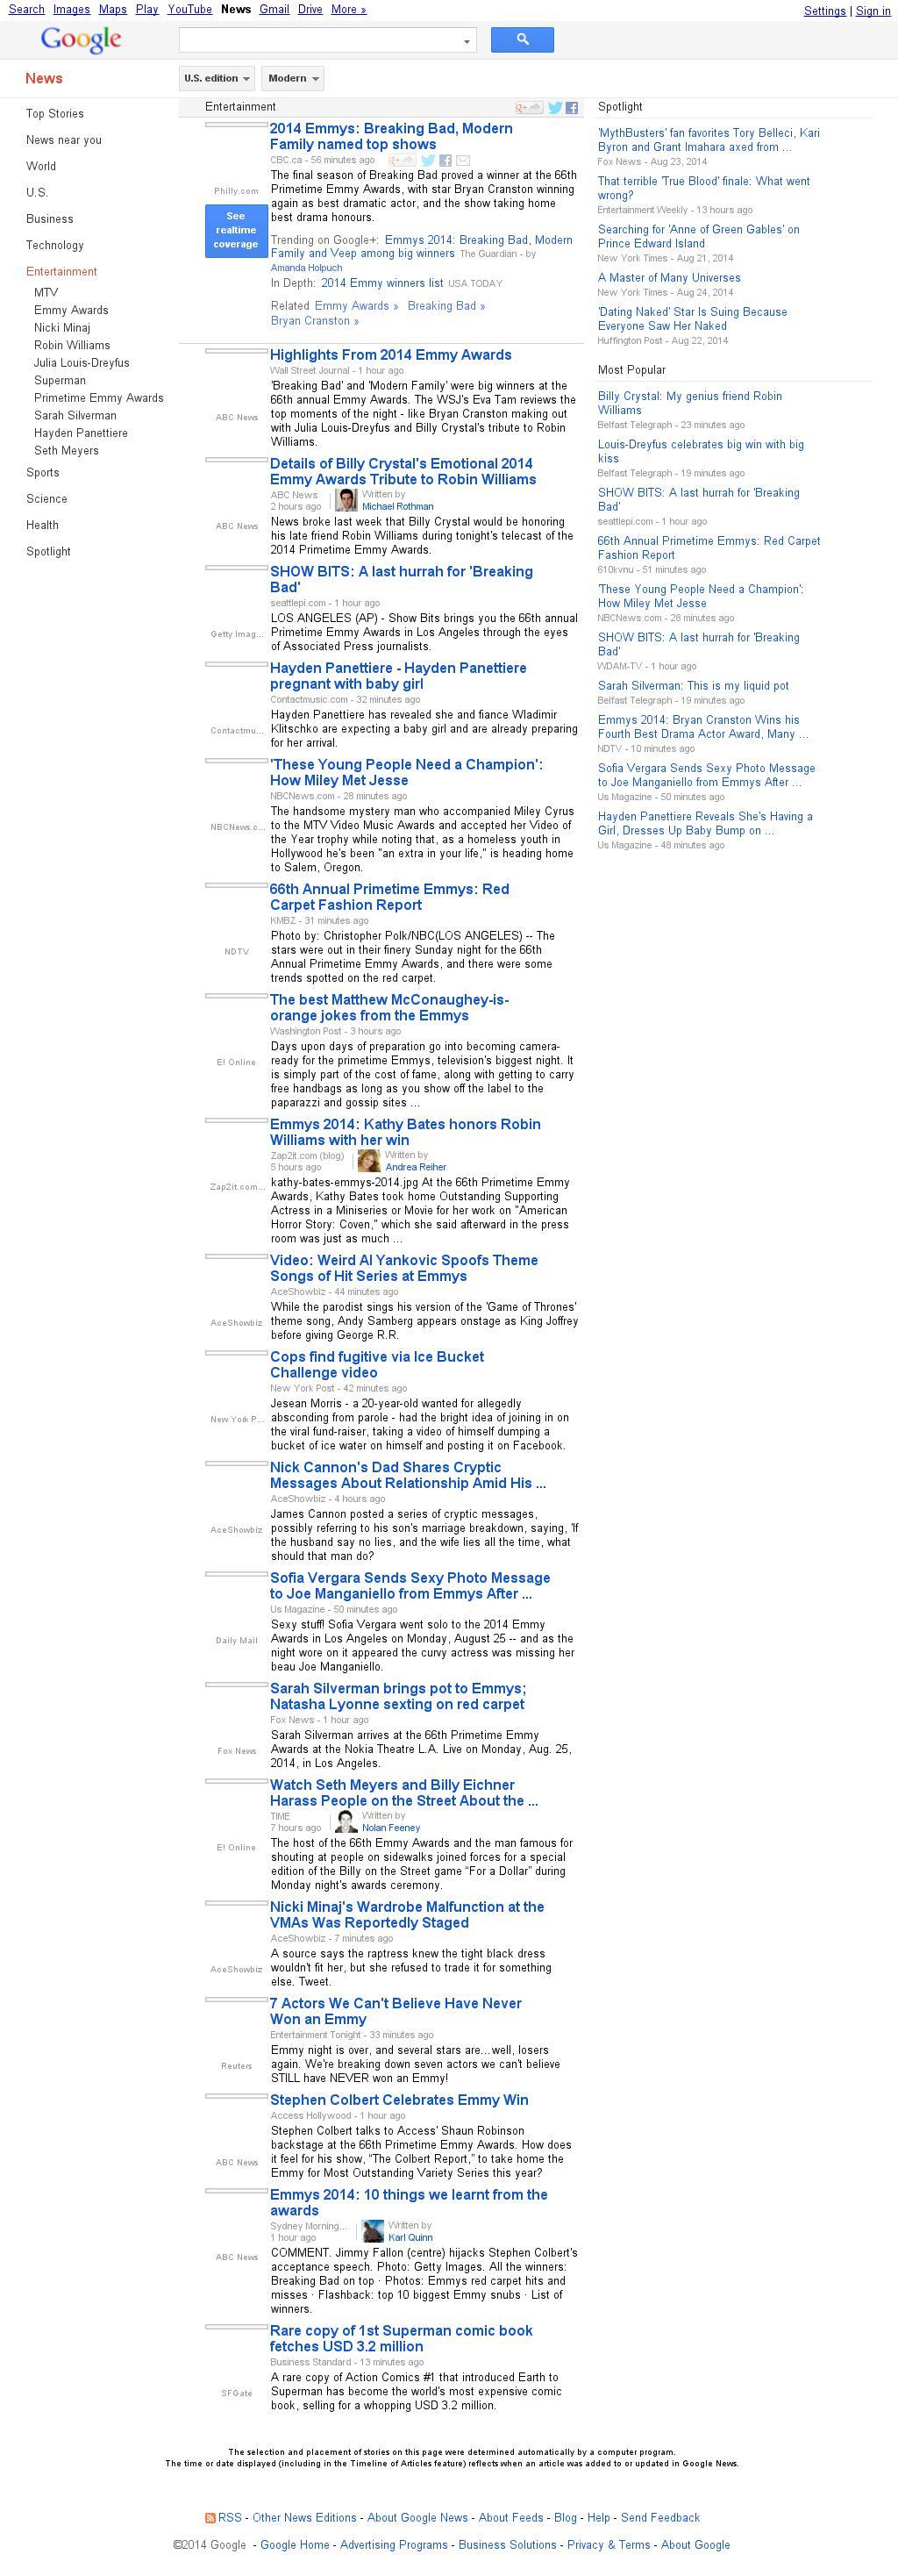 Google News: Entertainment at Tuesday Aug. 26, 2014, 10:06 a.m. UTC